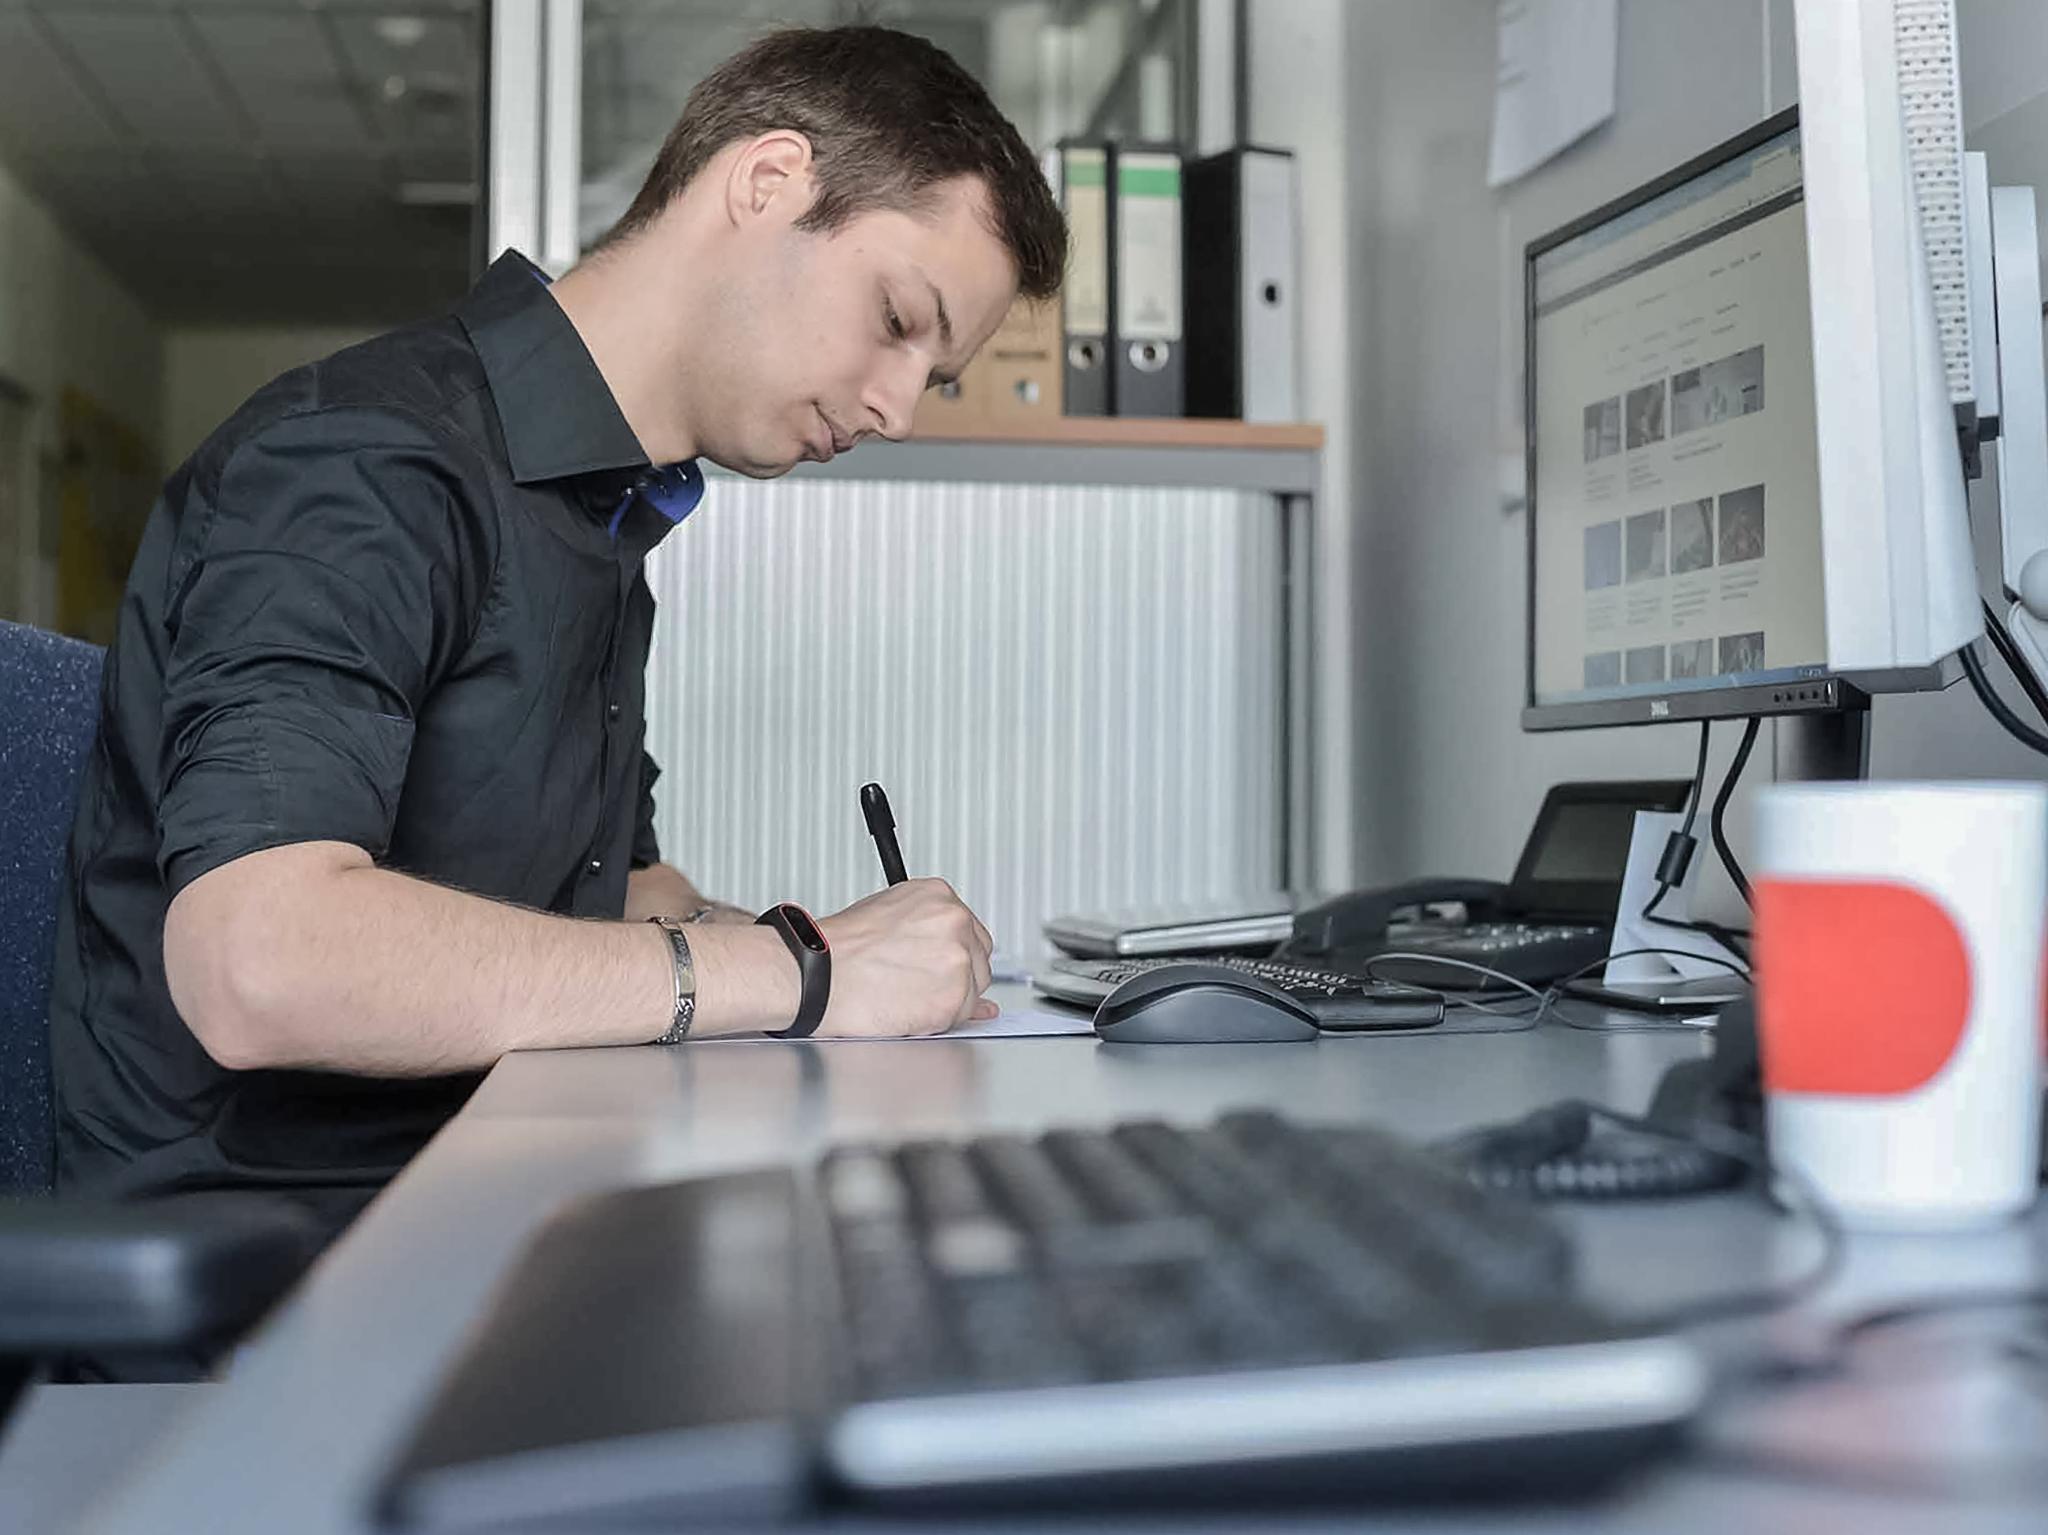 Wüma Trainee Patrick. Foto: JUntch/Vogel Business Media